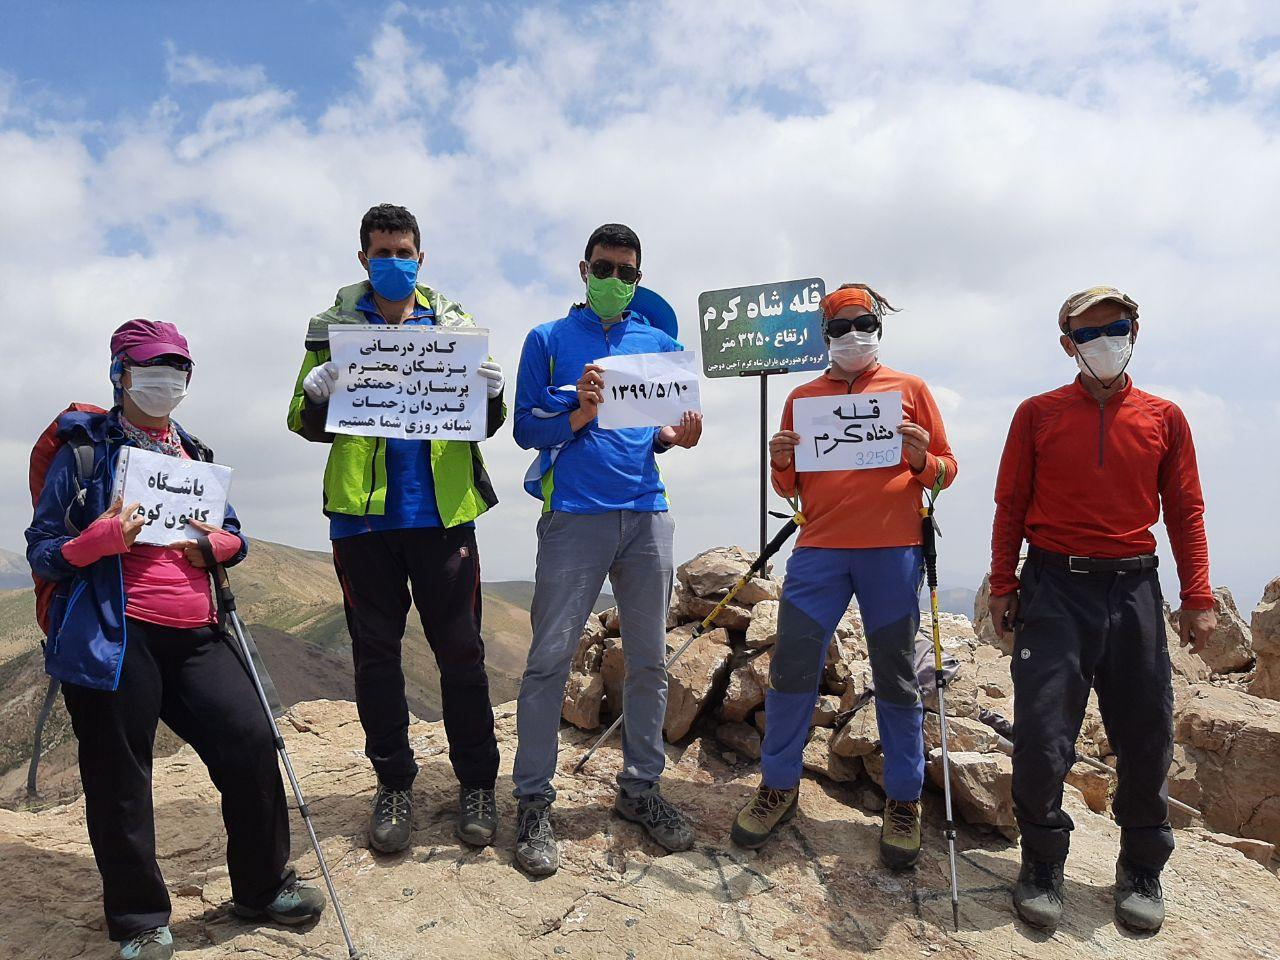 صعود همنوردان کانون کوه به قله شاه کرم